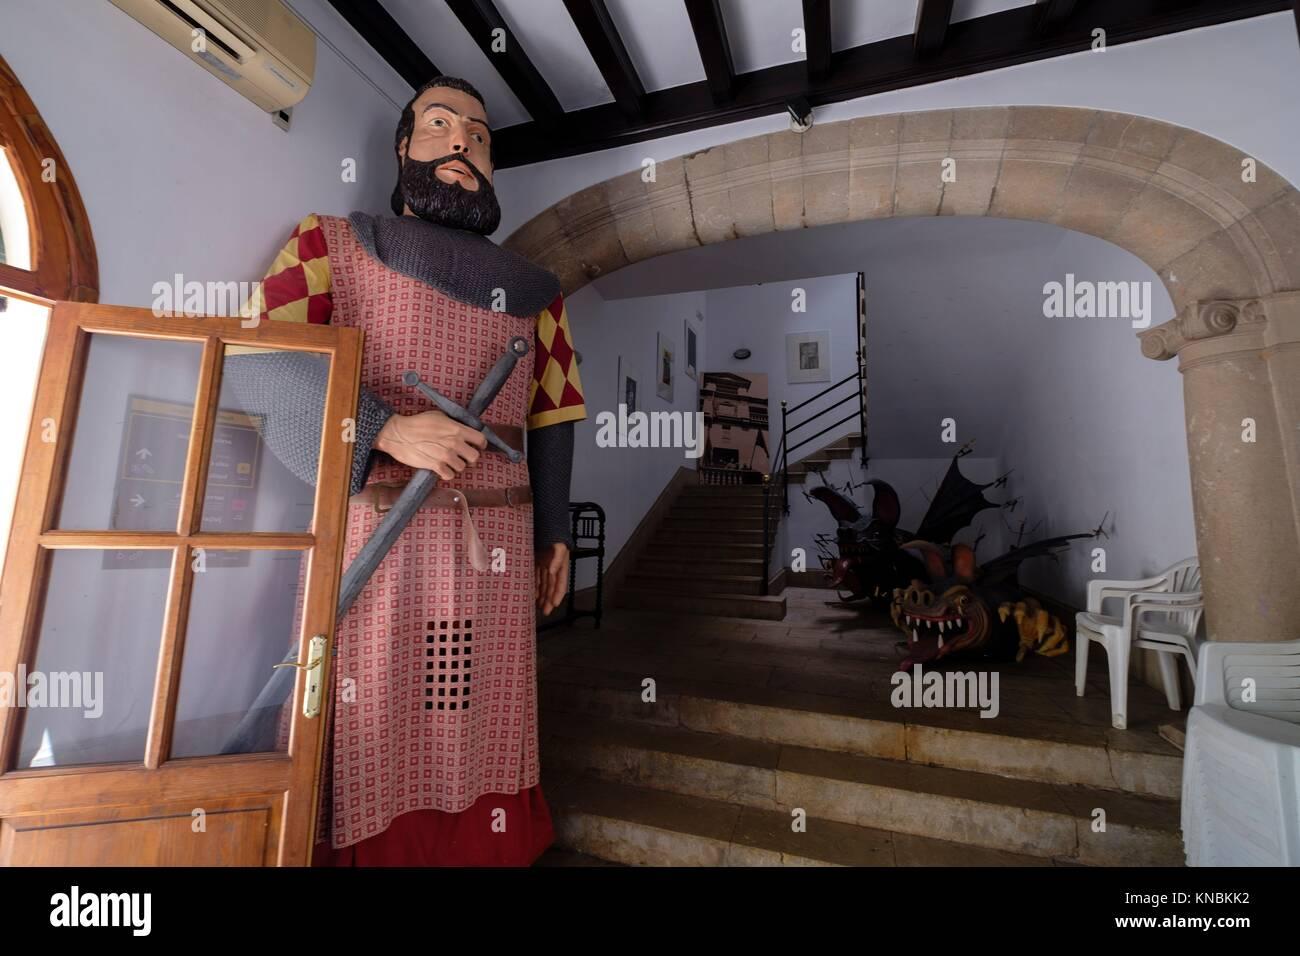 Plasterboard giants, Alaró, comarca de Raiguer, Mallorca, Balearic Islands, Spain. - Stock Image